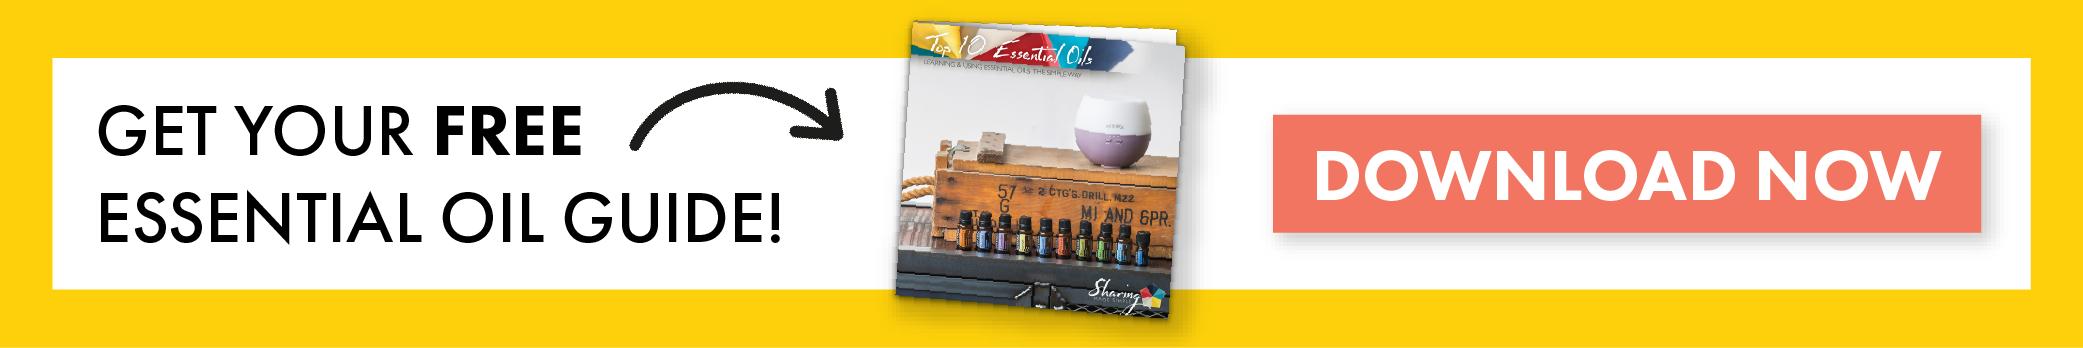 Top 10 doTERRA Essential Oil Guide Happy Healthy Joe Integrative Health Coach